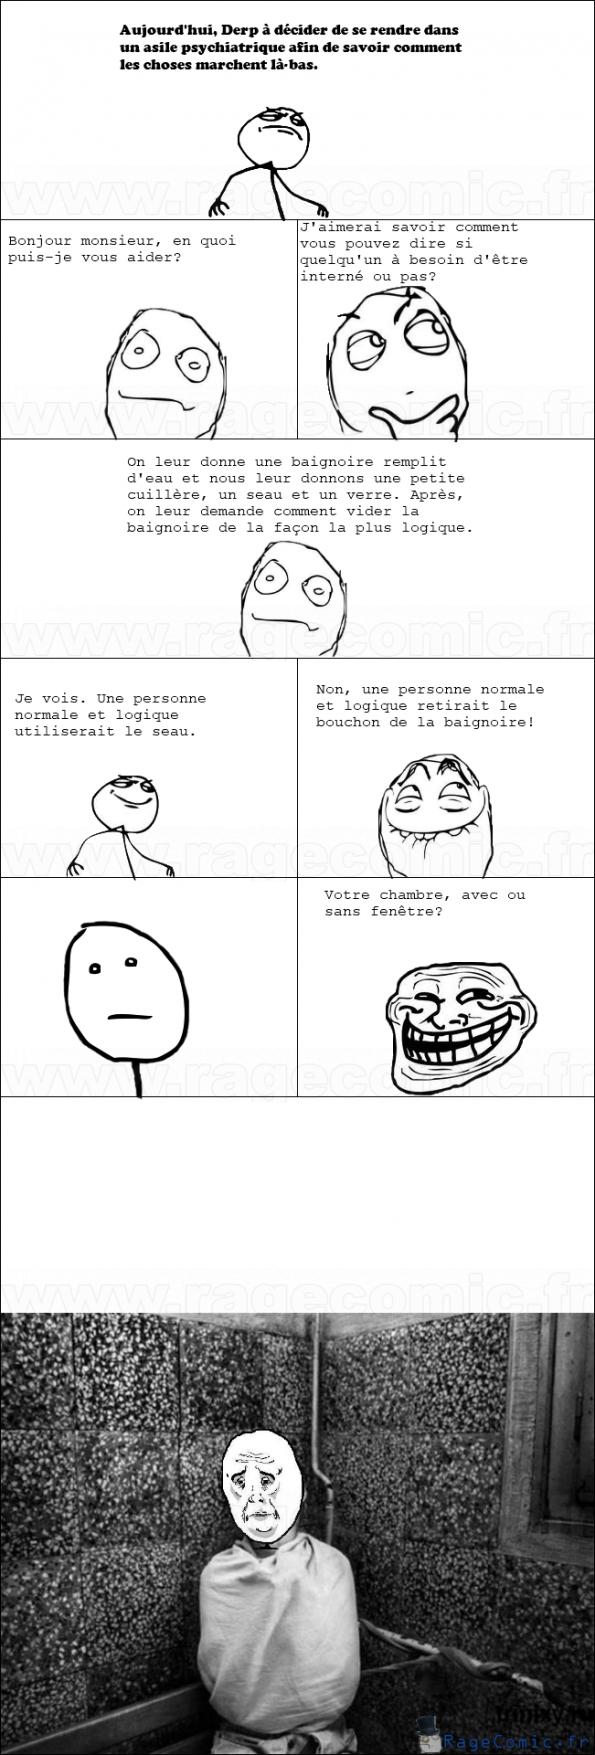 asile psychiatrique